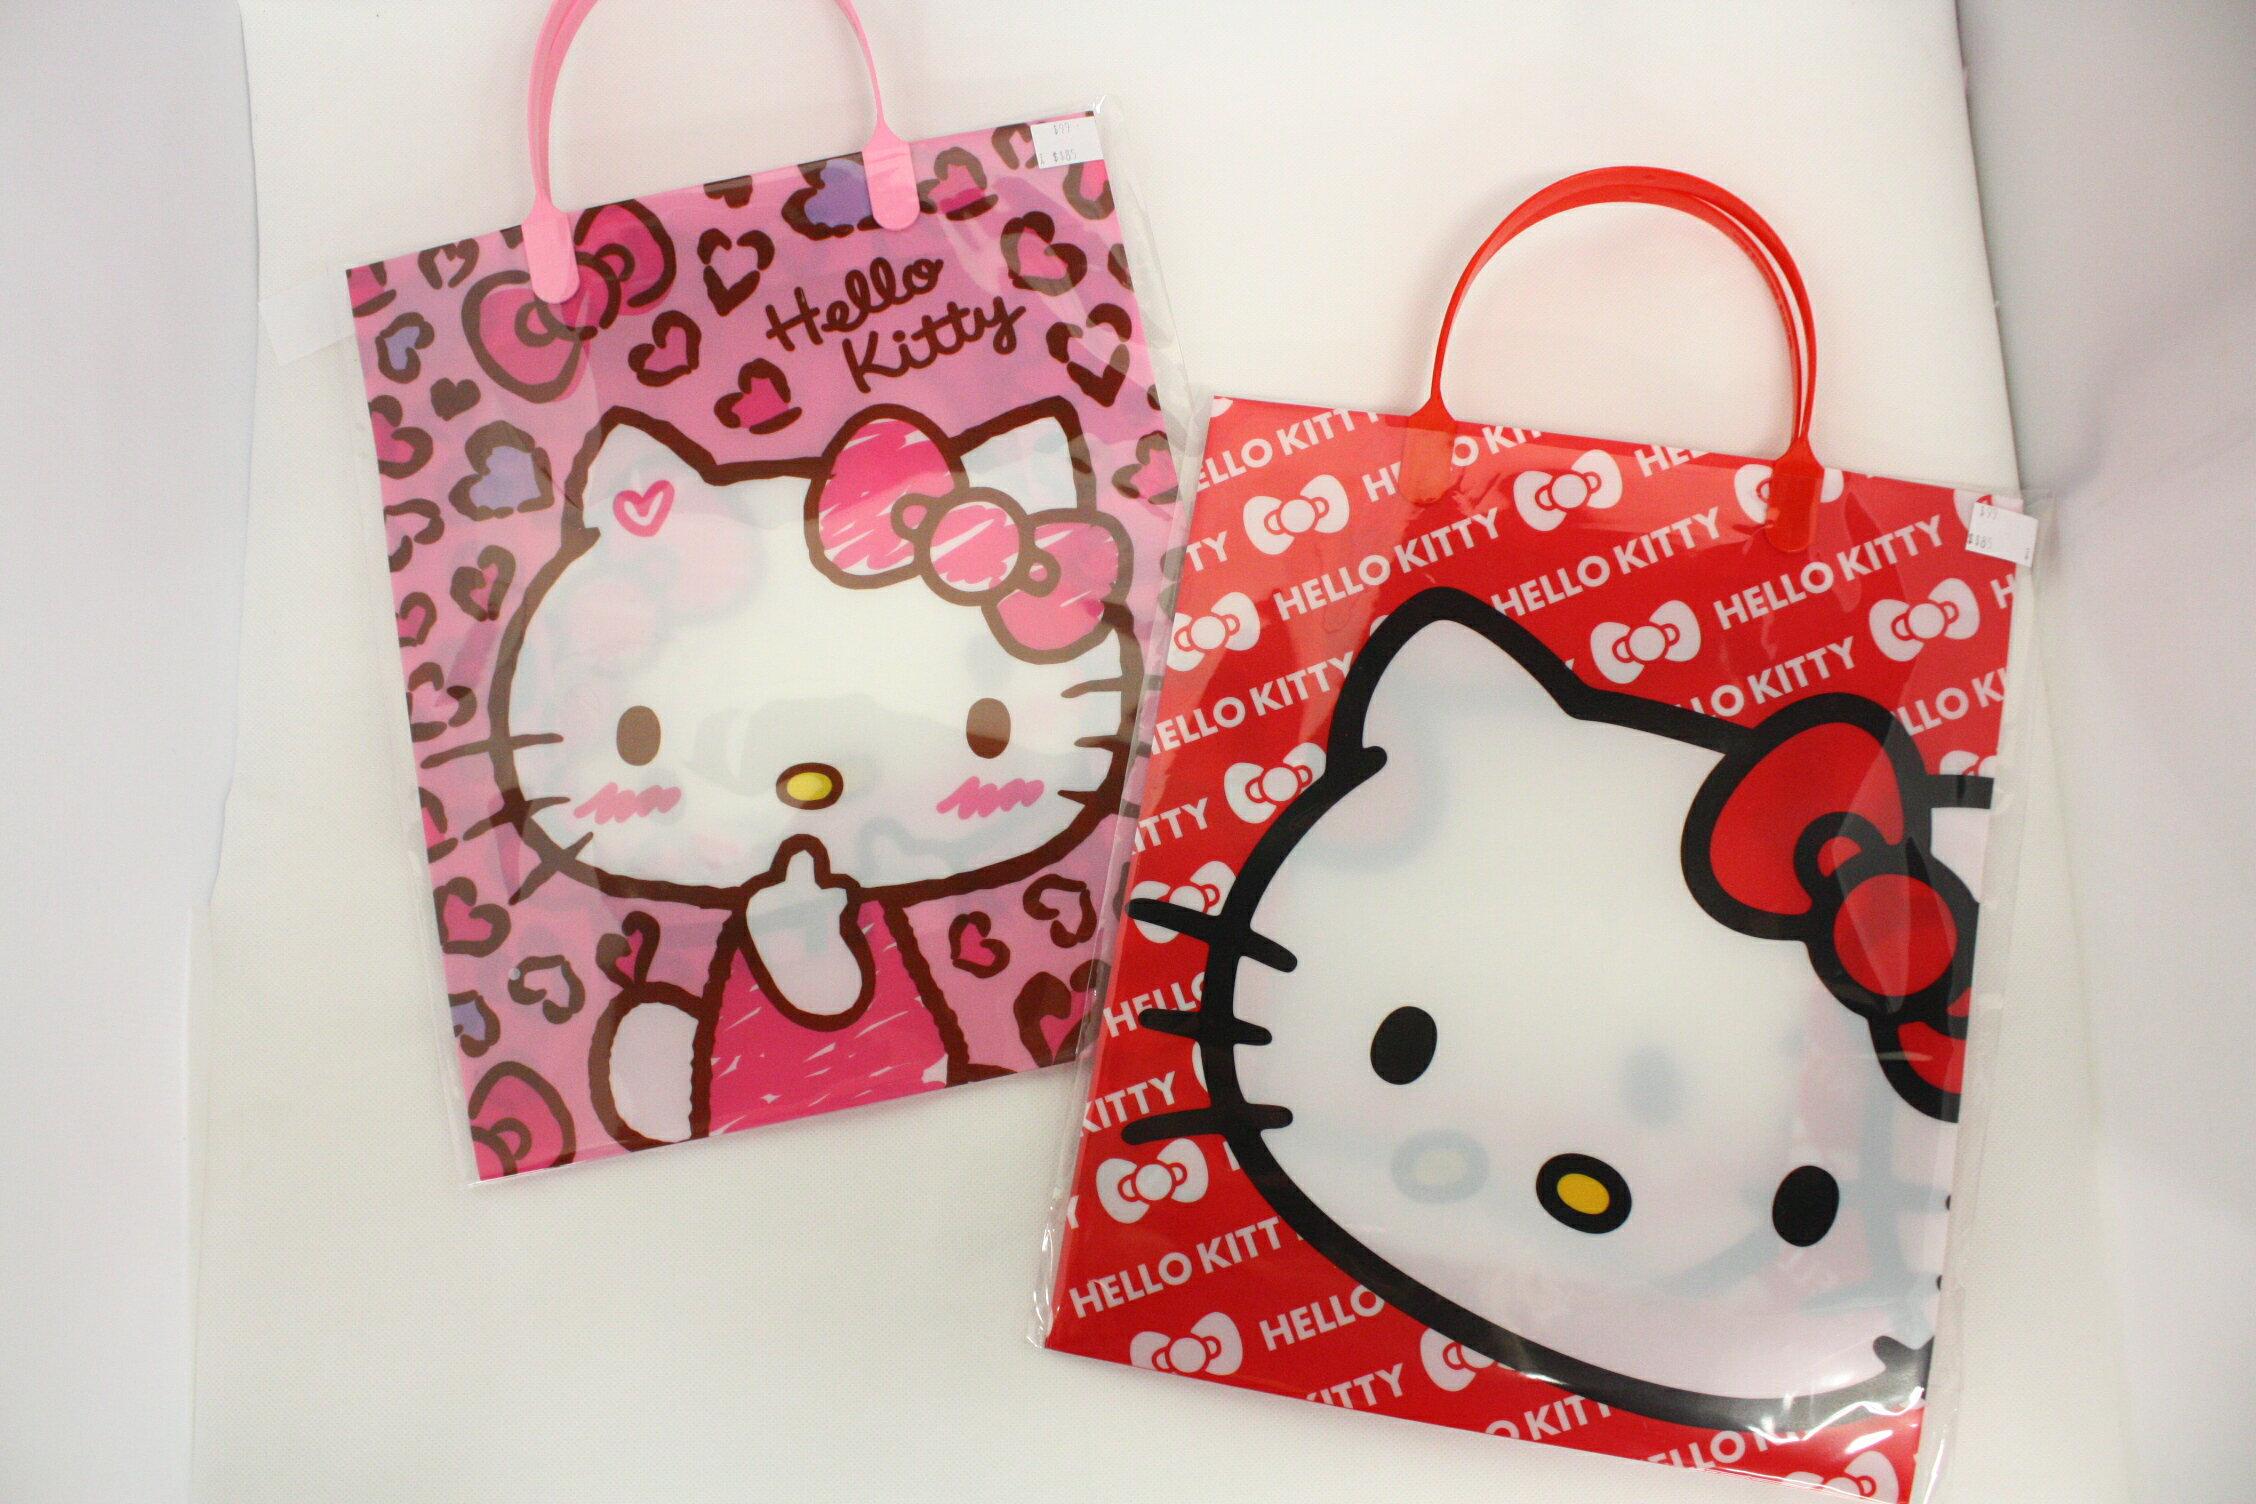 KITTY PP 壓紋 手提袋 三麗鷗 禮物袋 HELLO KITTY KT 凱蒂貓 正版授權 T0001 445